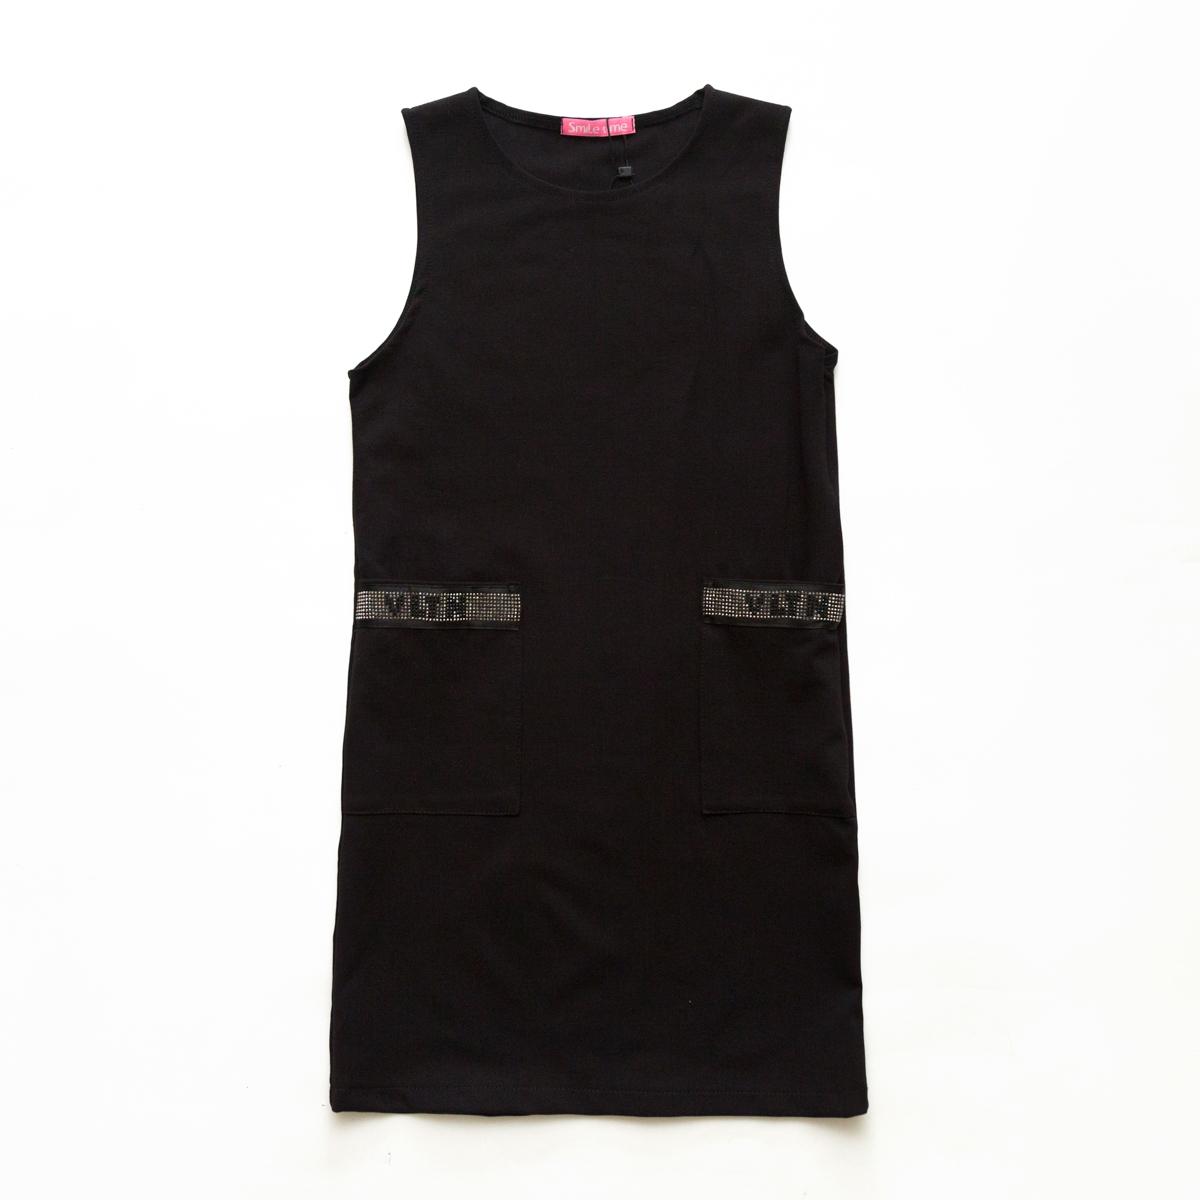 Сарафан SmileTime для девочки Valentino с карманами, черный